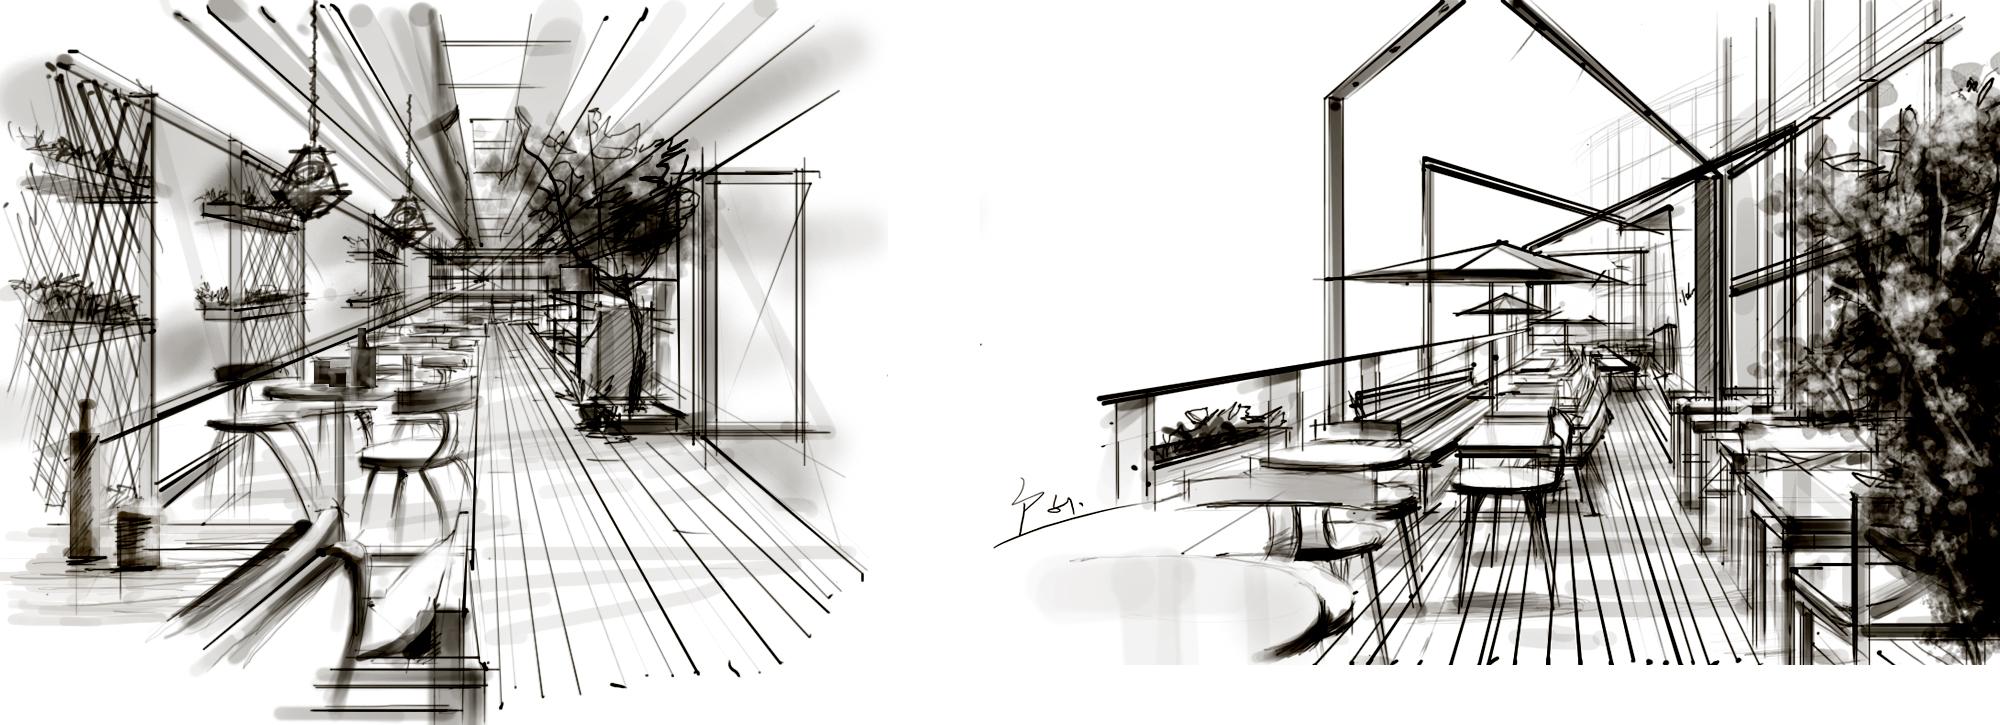 loft效果图手绘